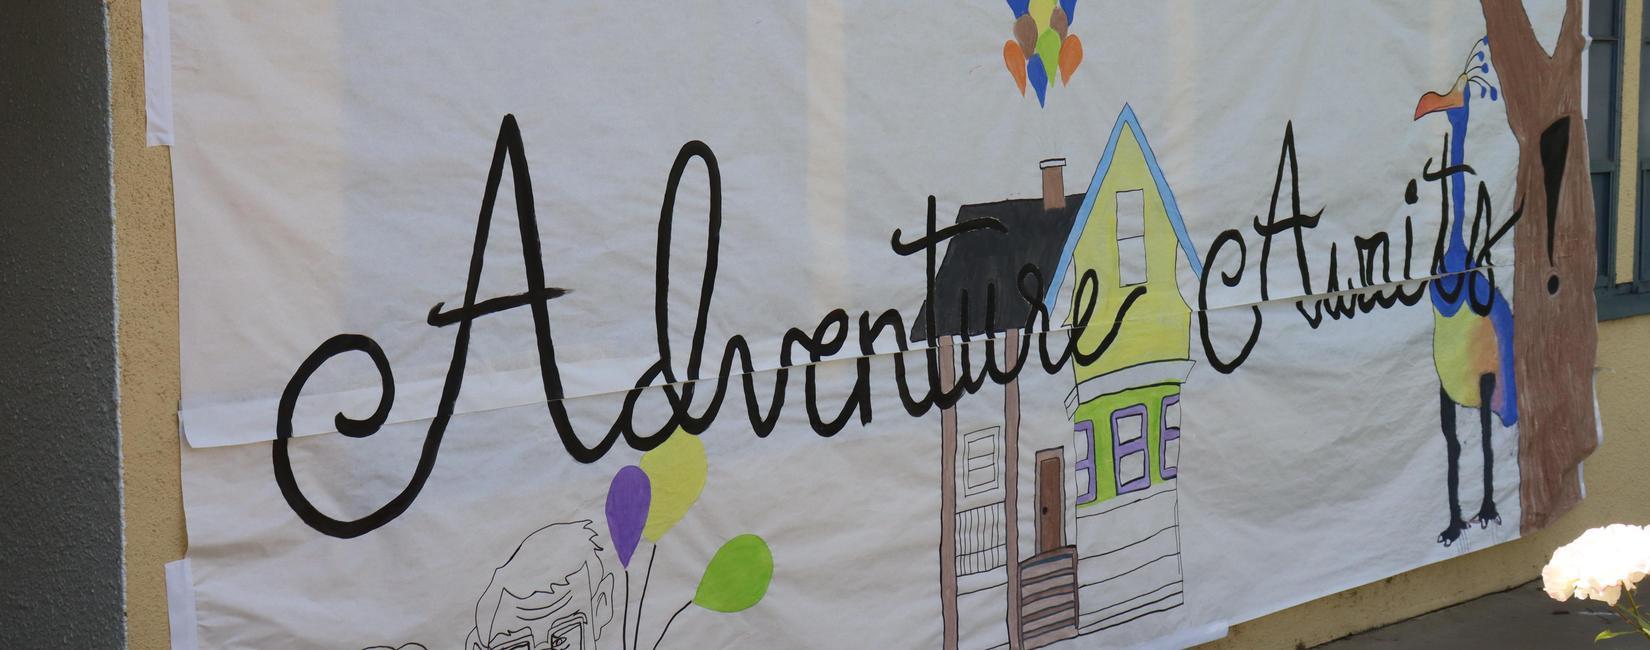 Photo: Adventure Awaits